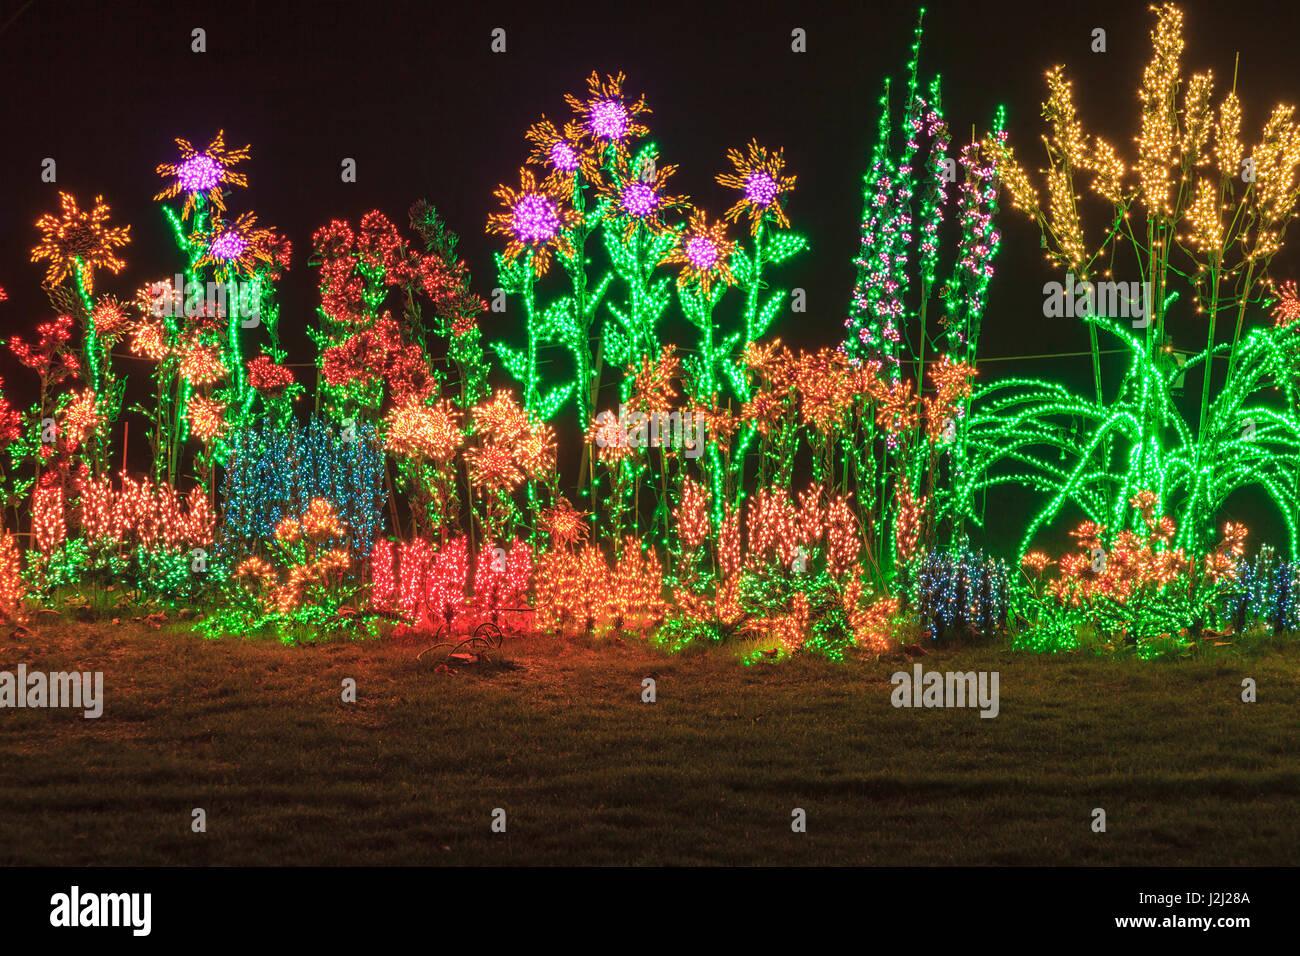 festival of lights bellevue botanical garden bellevue wa usa stock image - Bellevue Christmas Lights